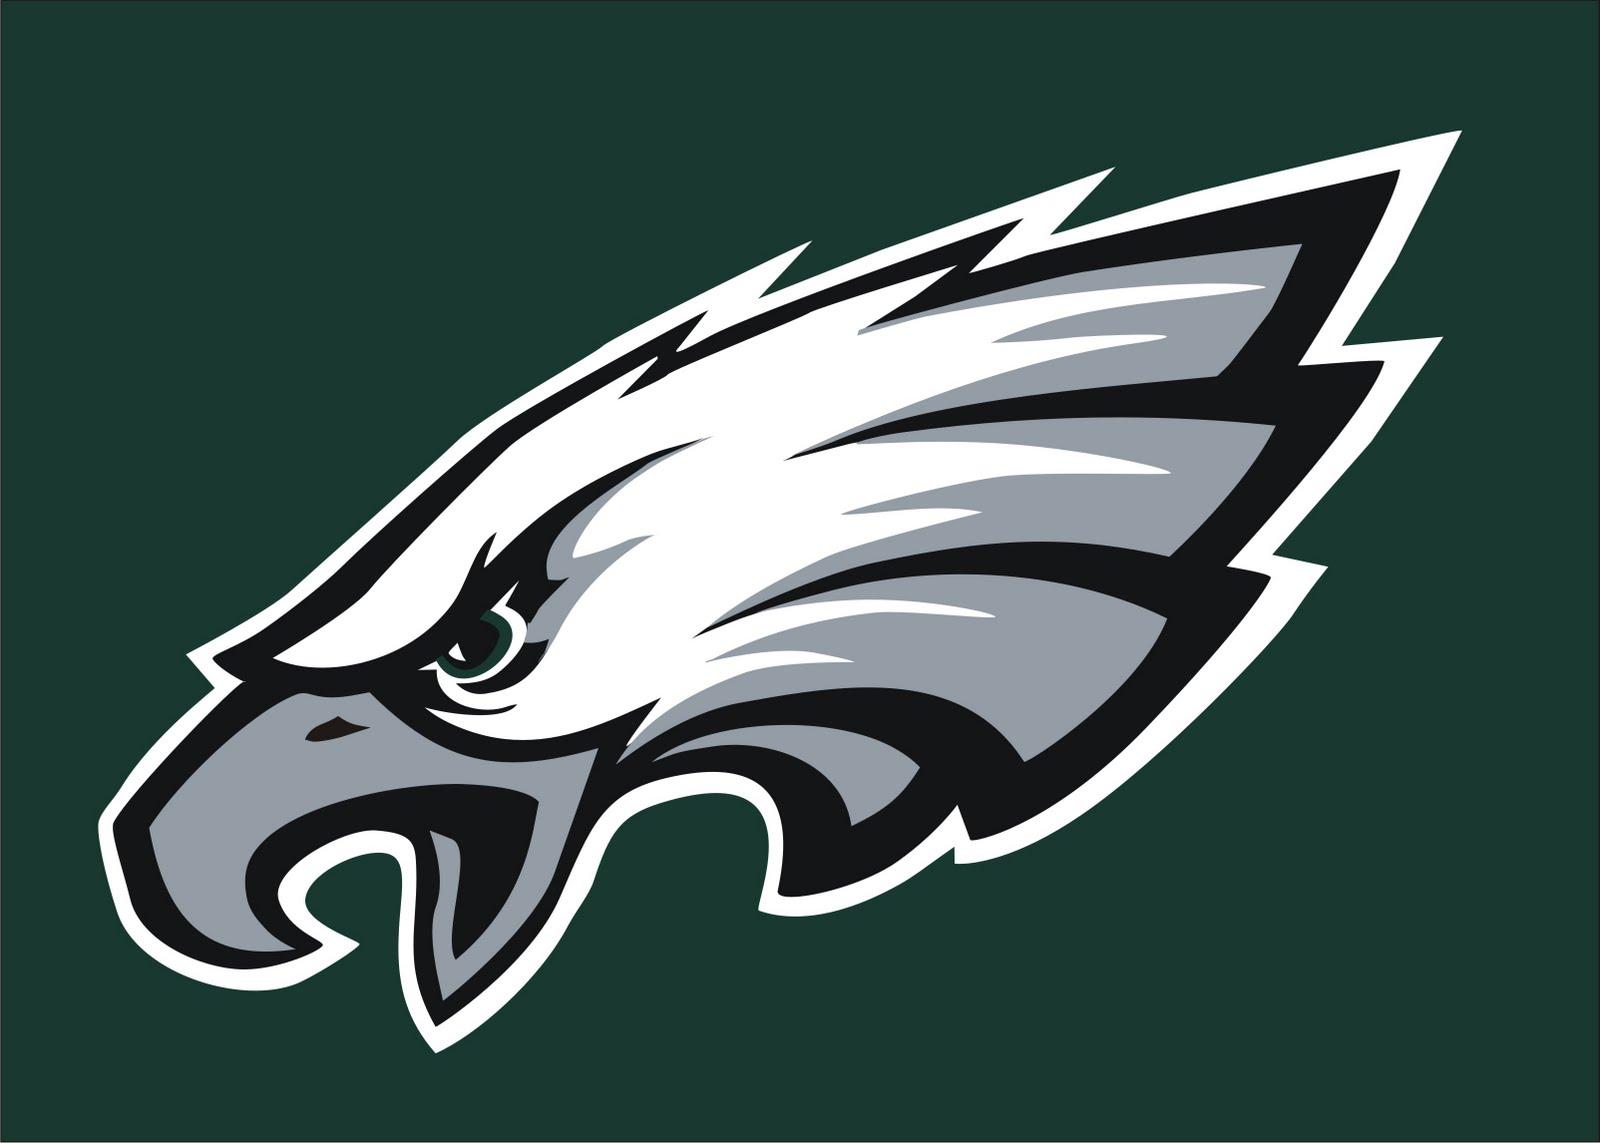 Eagles+Football+Logo Isra3l Yán3z DESING: Practica nº 13 Eagle Football Logo